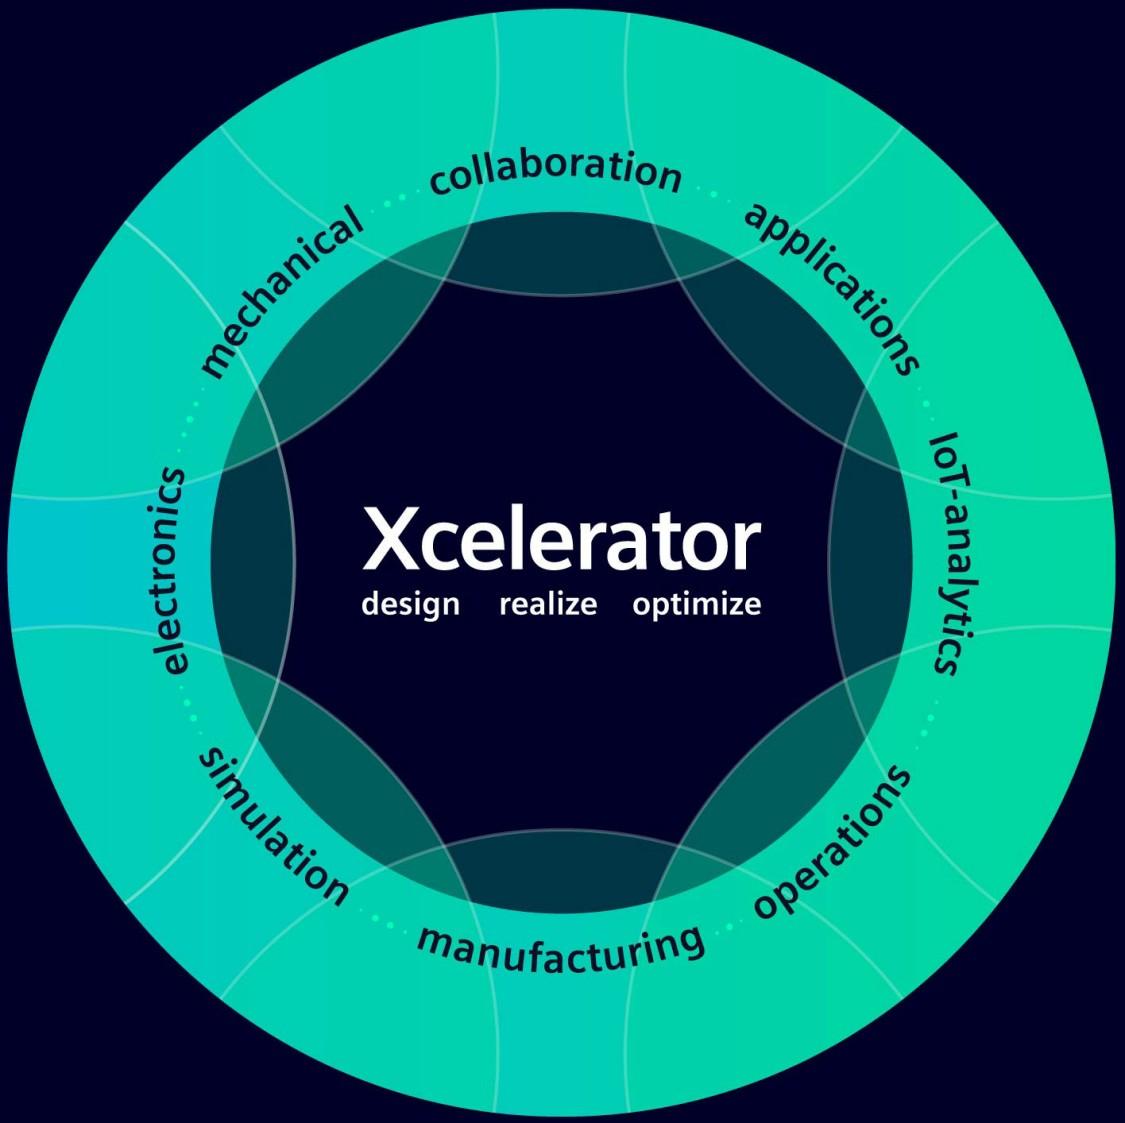 Discover the Xcelerator portfolio of software, services, and an application development platform